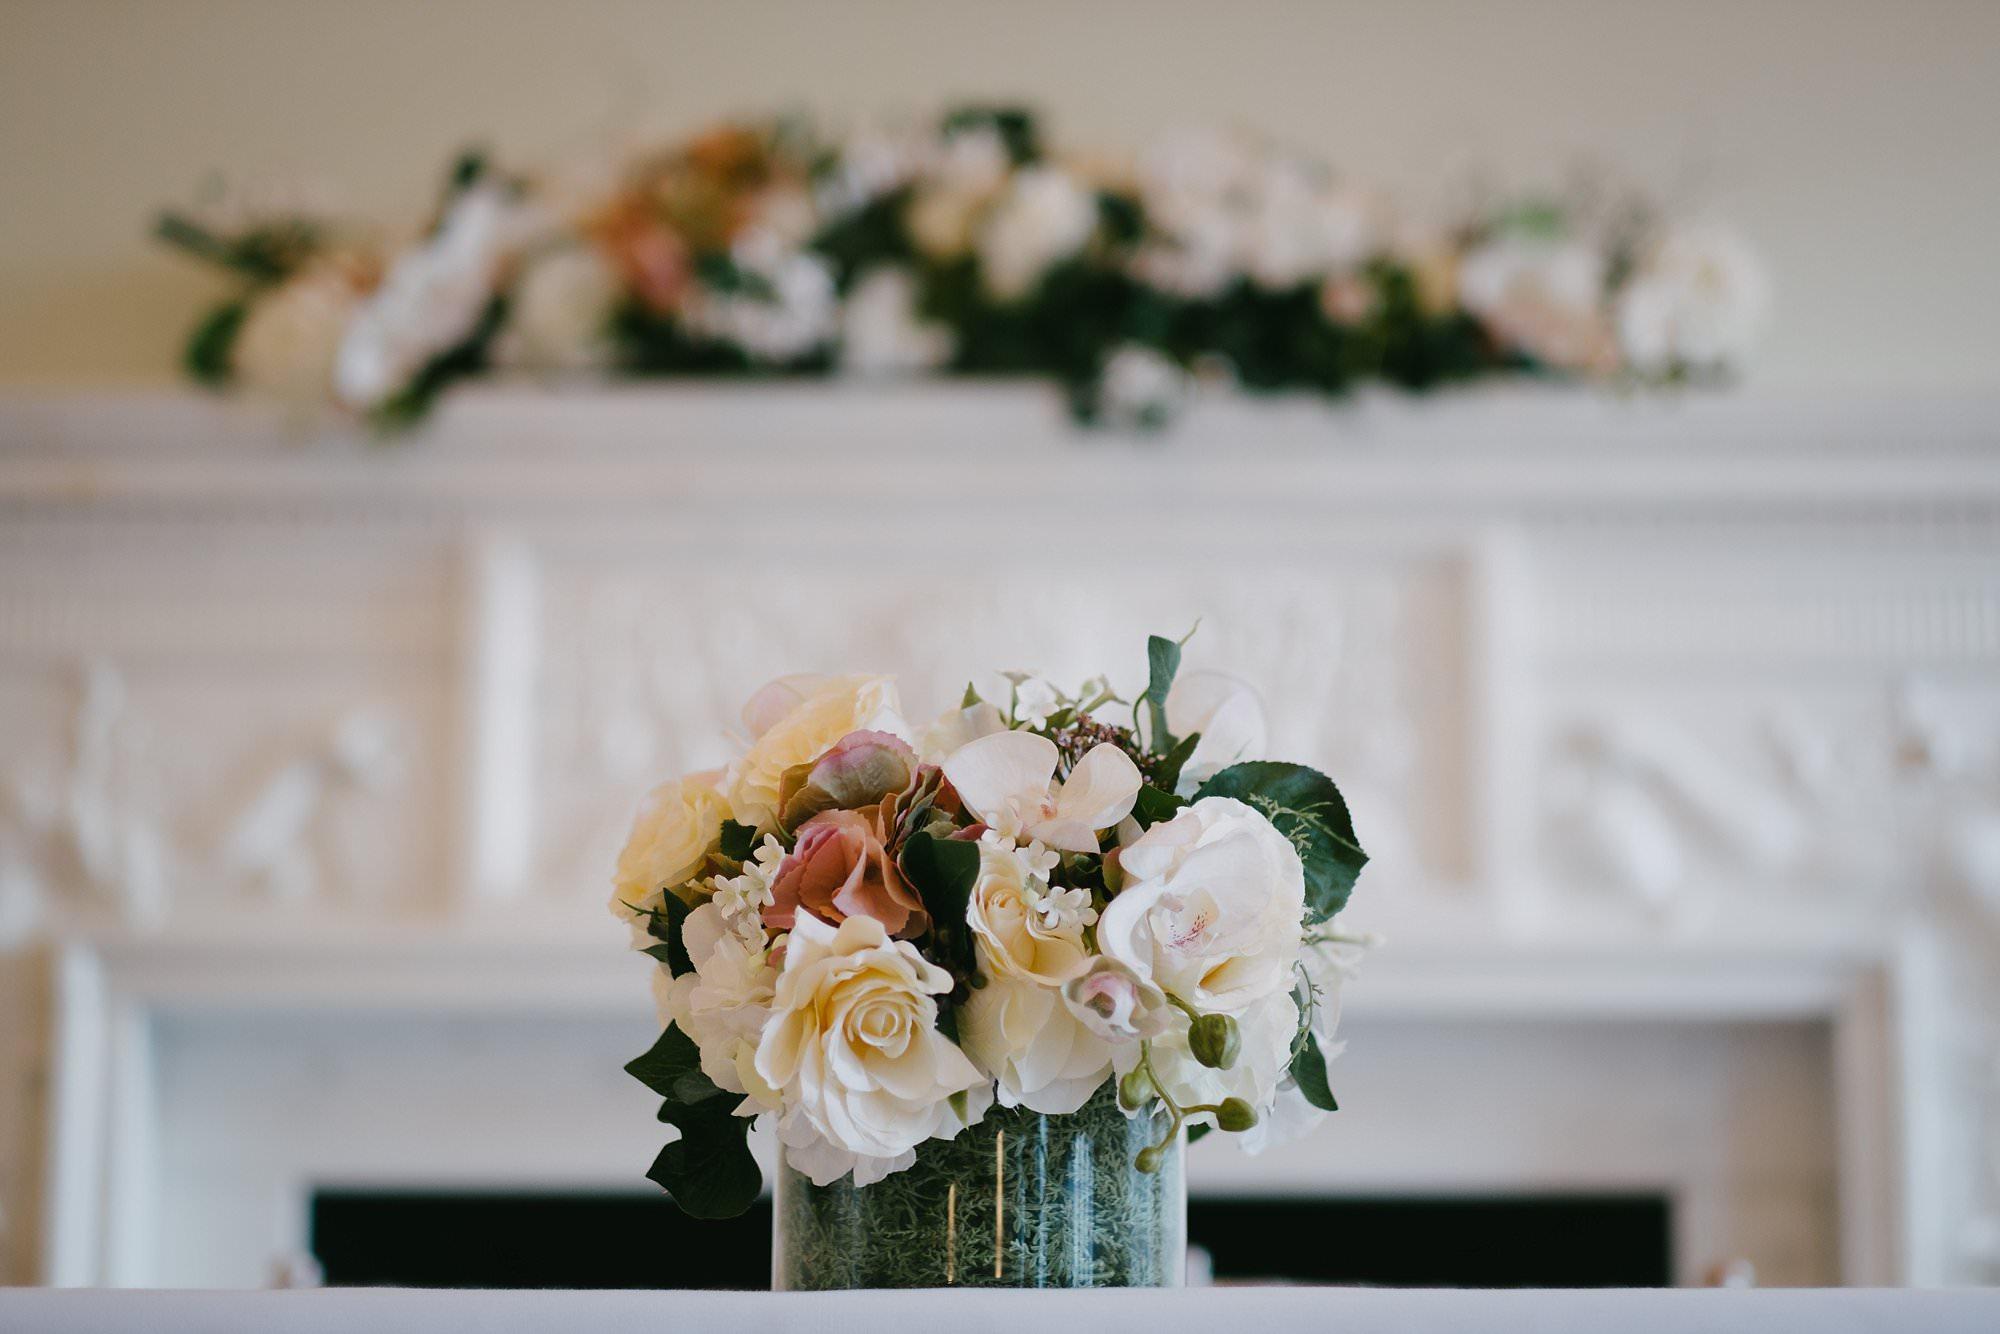 asia house london wedding photographer 015 - Rachel + Gabriel   Asia House Wedding Photography